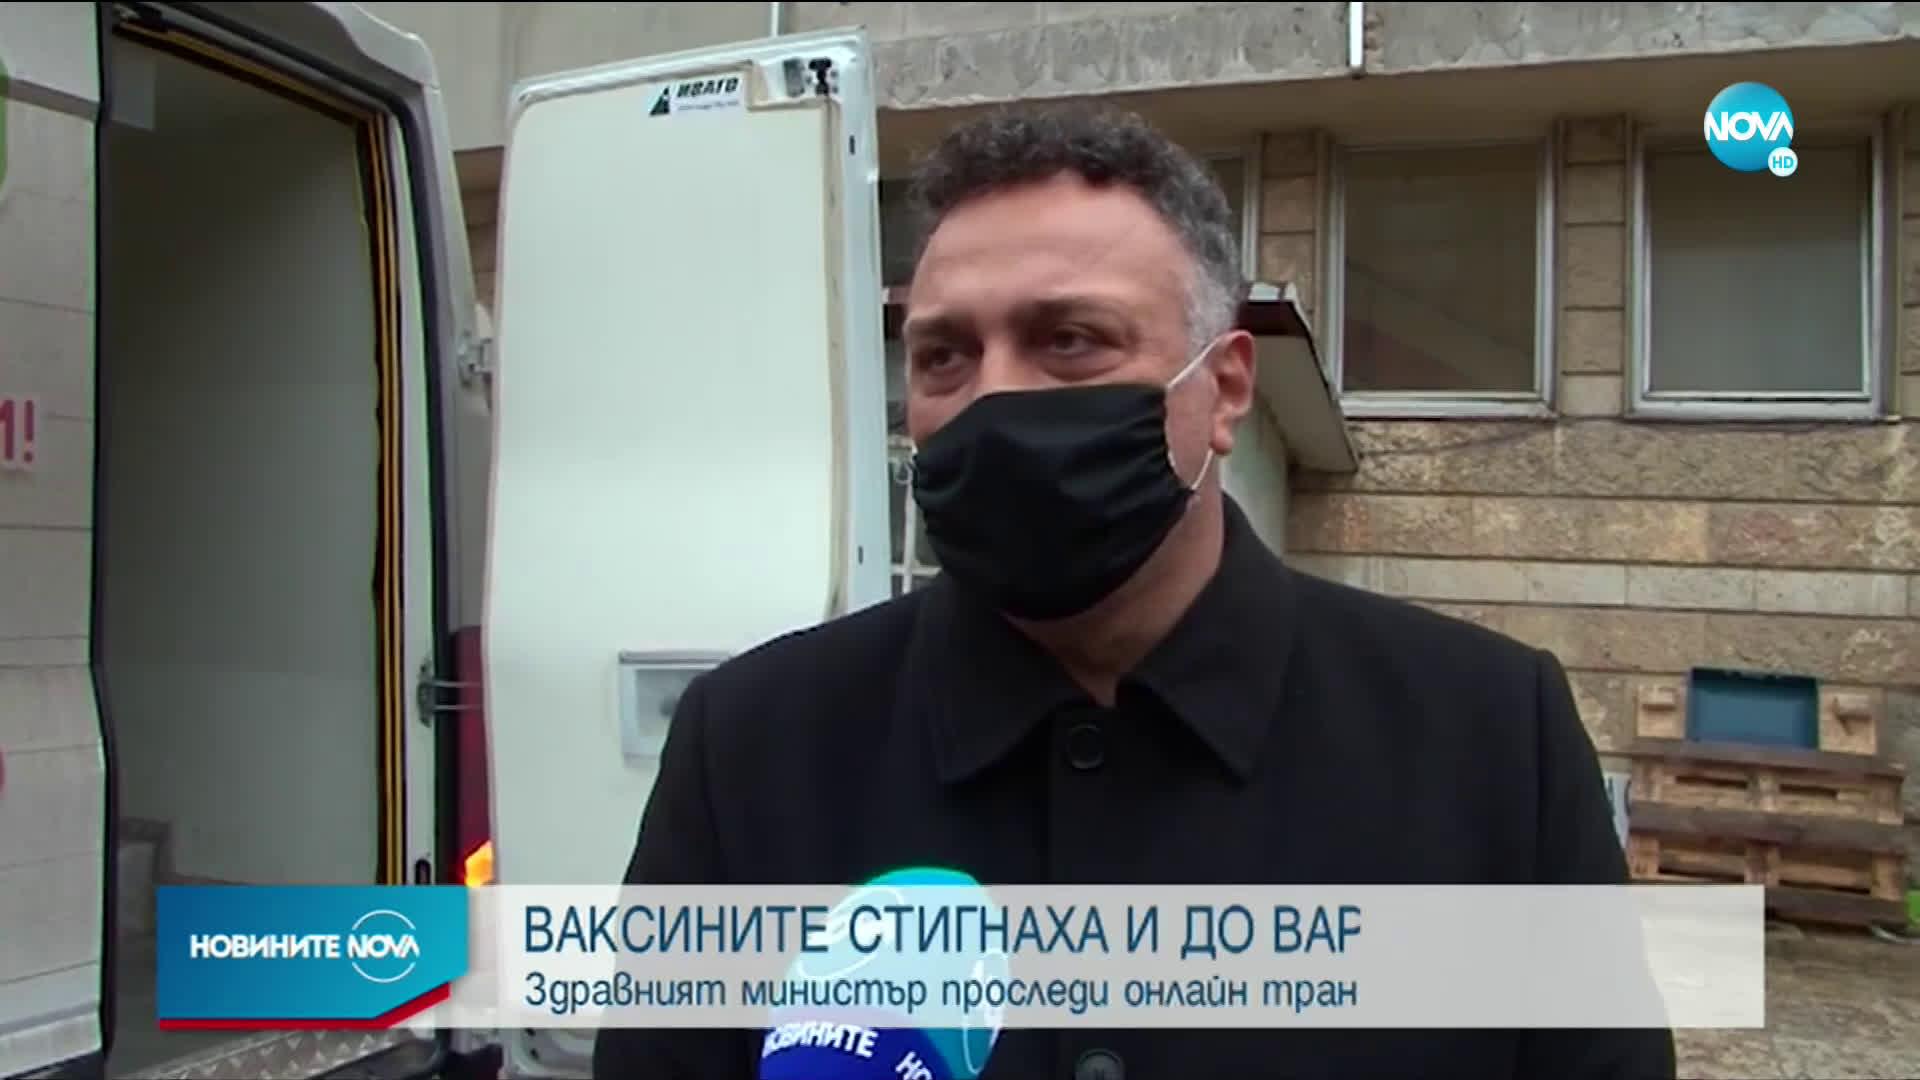 Ваксините срещу COVID-19 пристигнаха и в Бургас